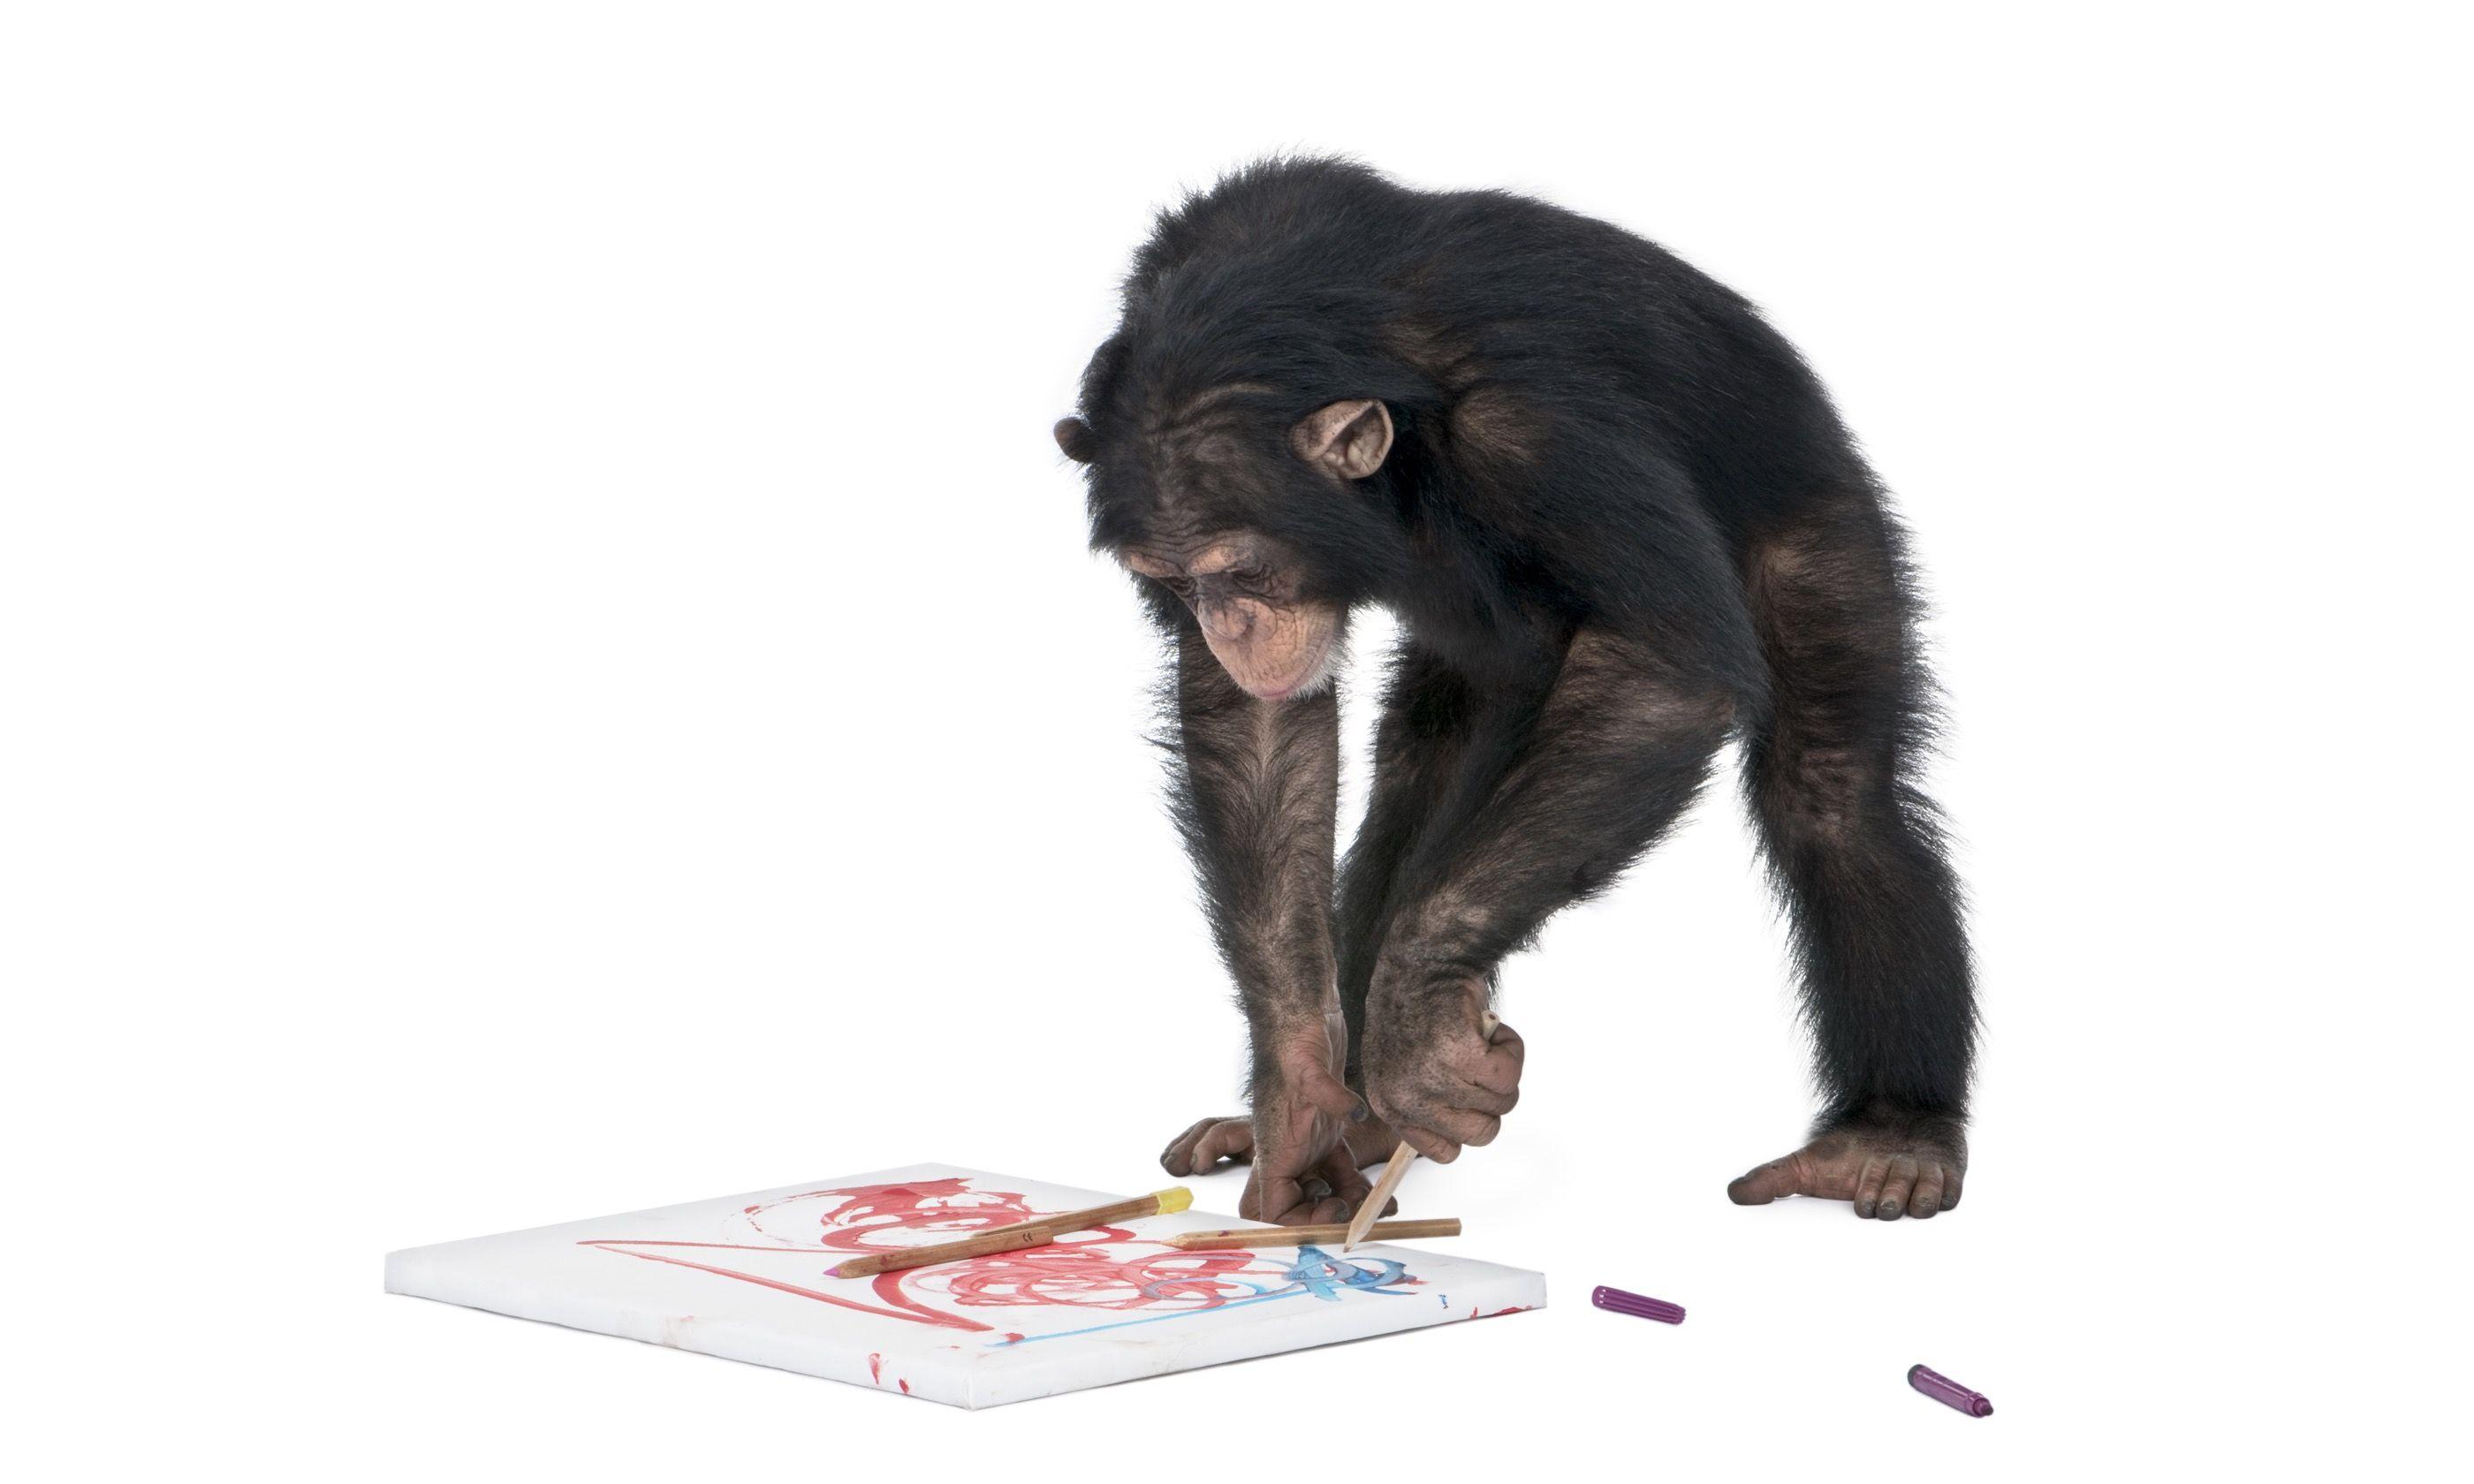 Chimp painting (Dreamstime)